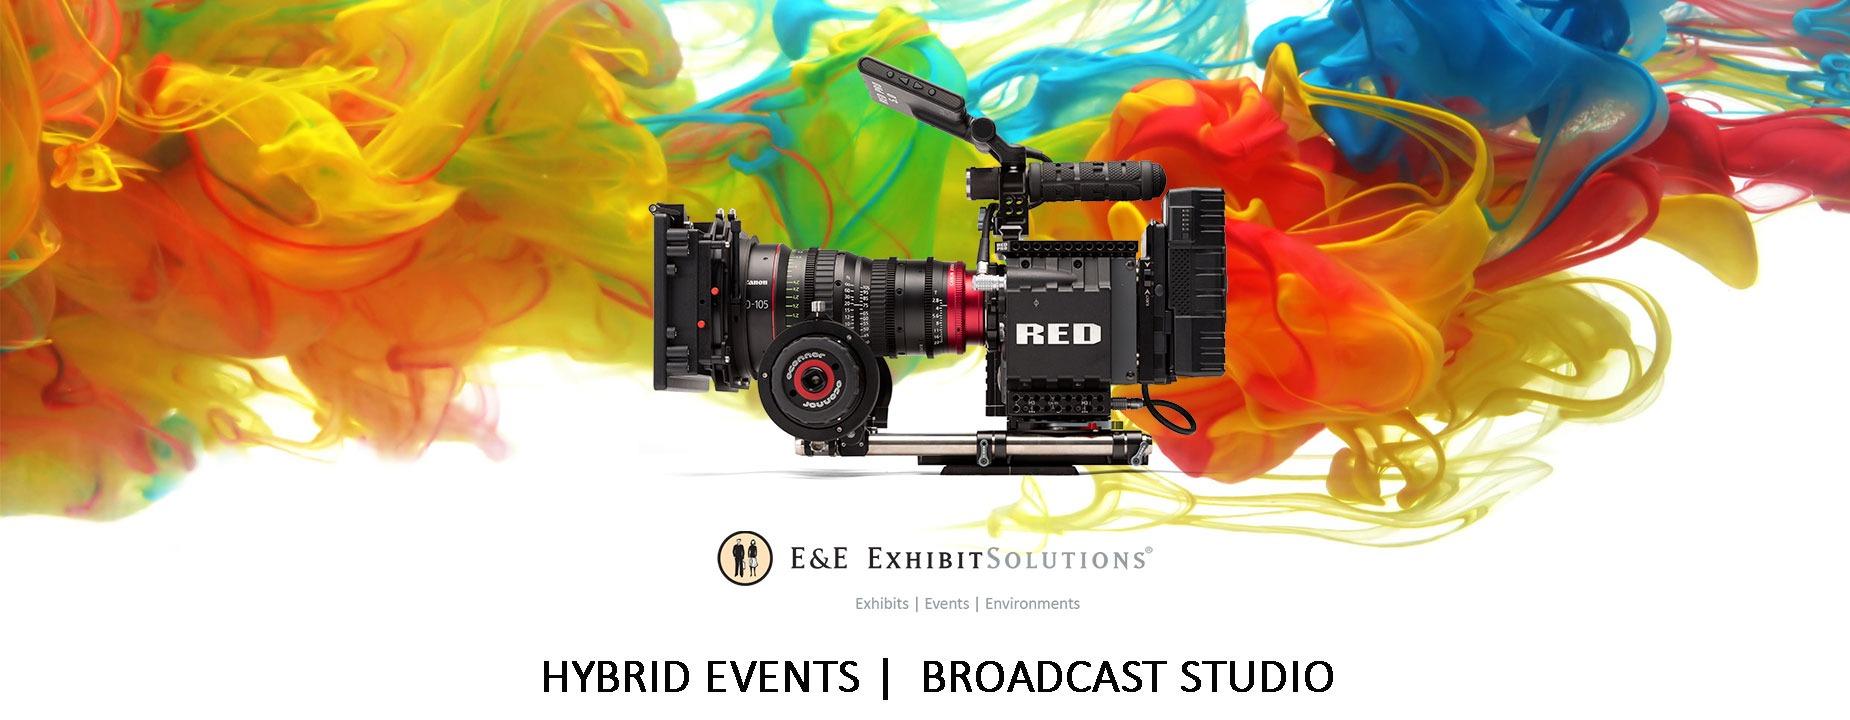 Phoenix Video Production Studio For Rent